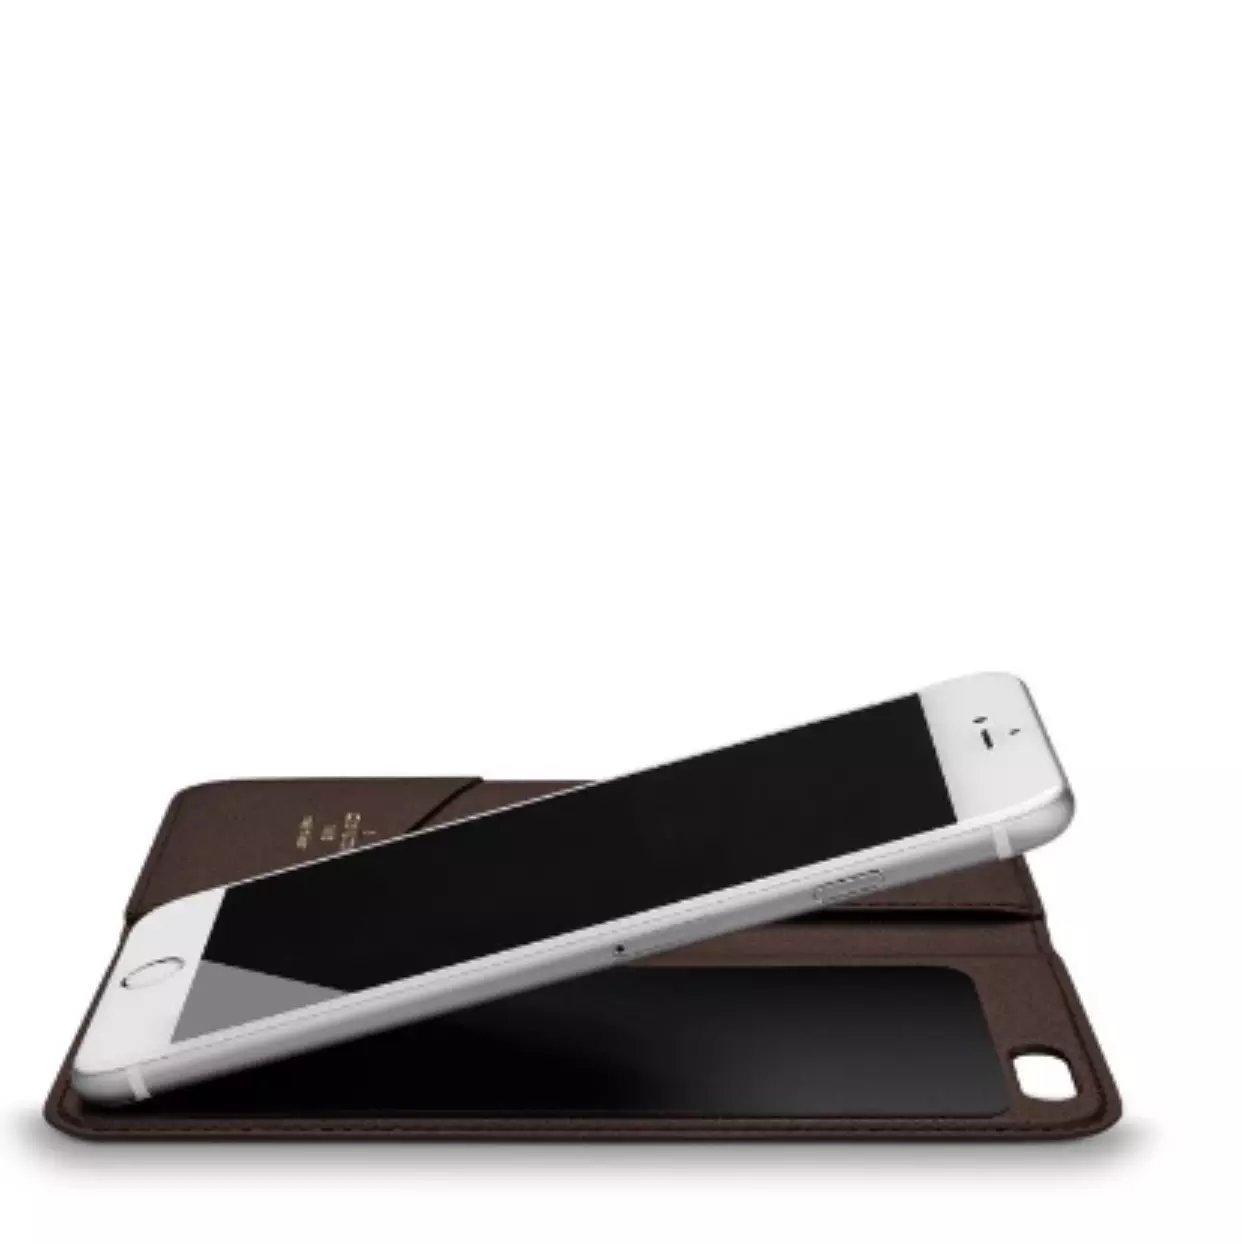 iphone hülle kaufen iphone hülle mit foto bedrucken Louis Vuitton iphone 8 hüllen smartphone ca8 elbst gestalten ihpne 8 größe iphone 8 handyhülle samsung gala8y s3 8lbst gestalten iphone 8 hülle muster iphone 8 angebot